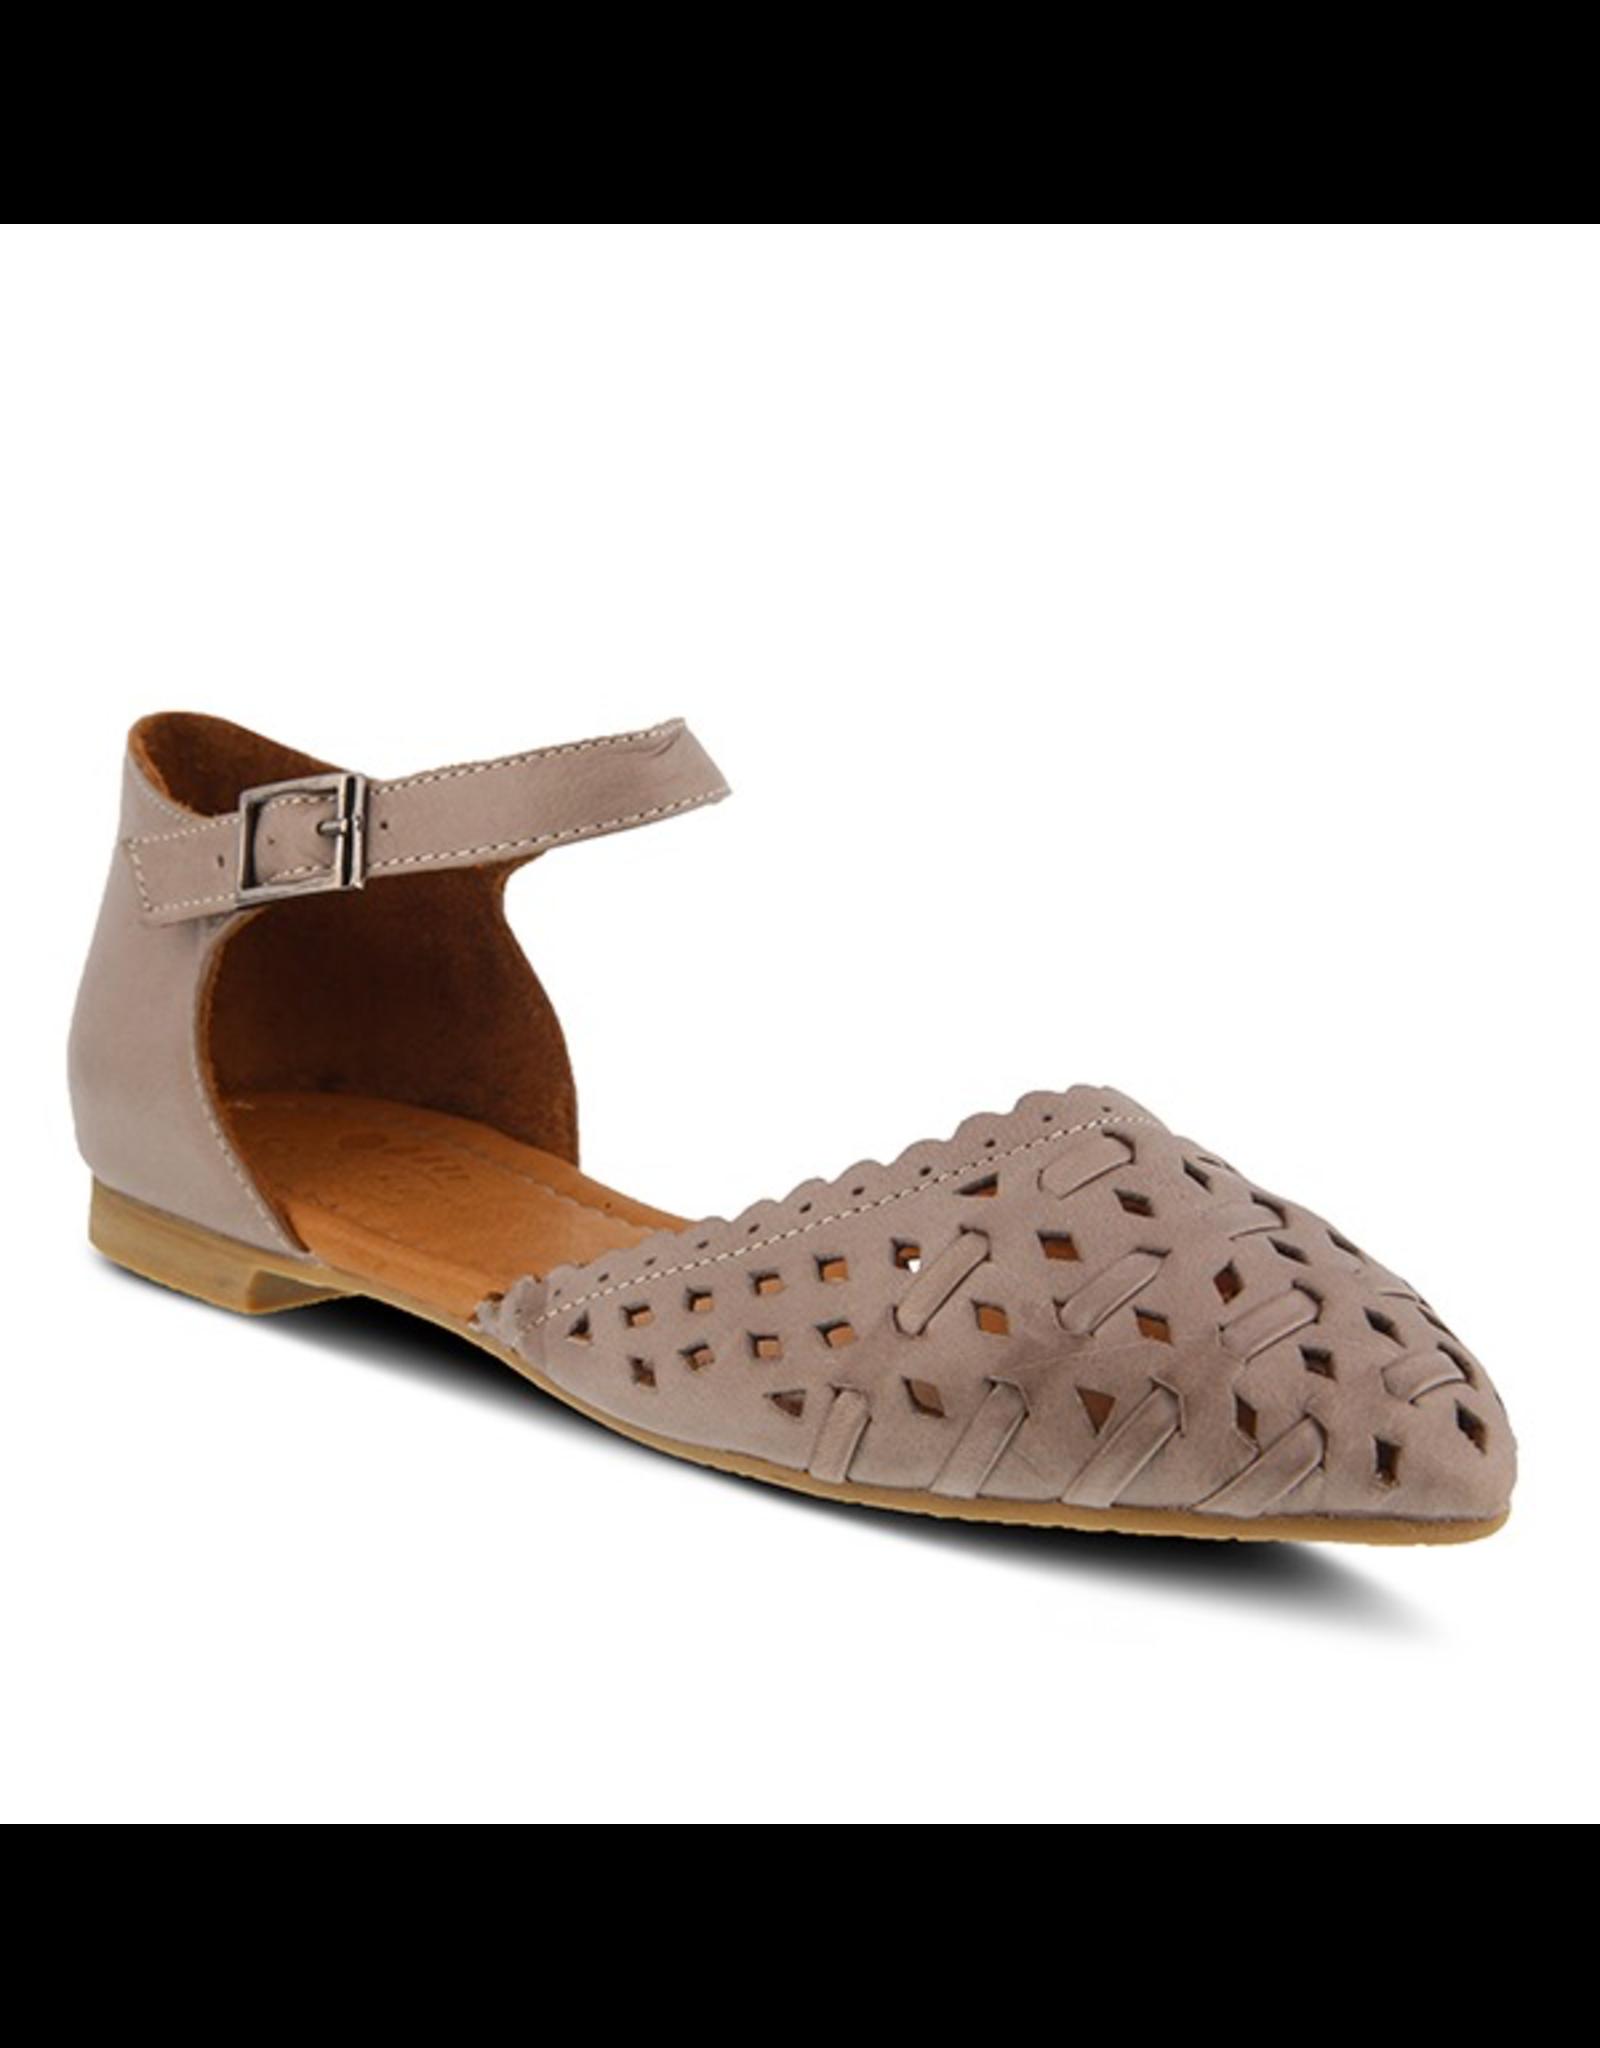 Spring Footwear Leather Sandal